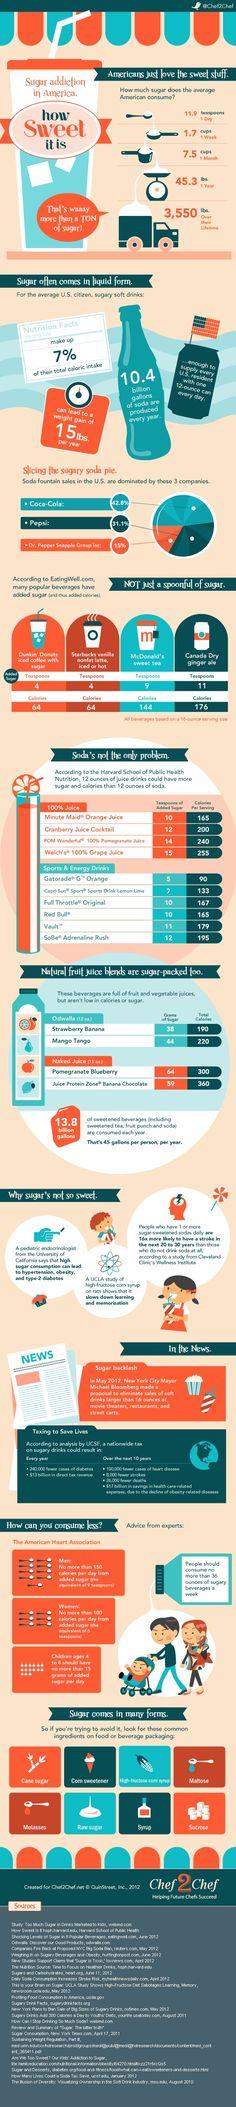 9 tsp of added sugar in McDonald's sweet tea, 10 in Minute Maid orange juice…